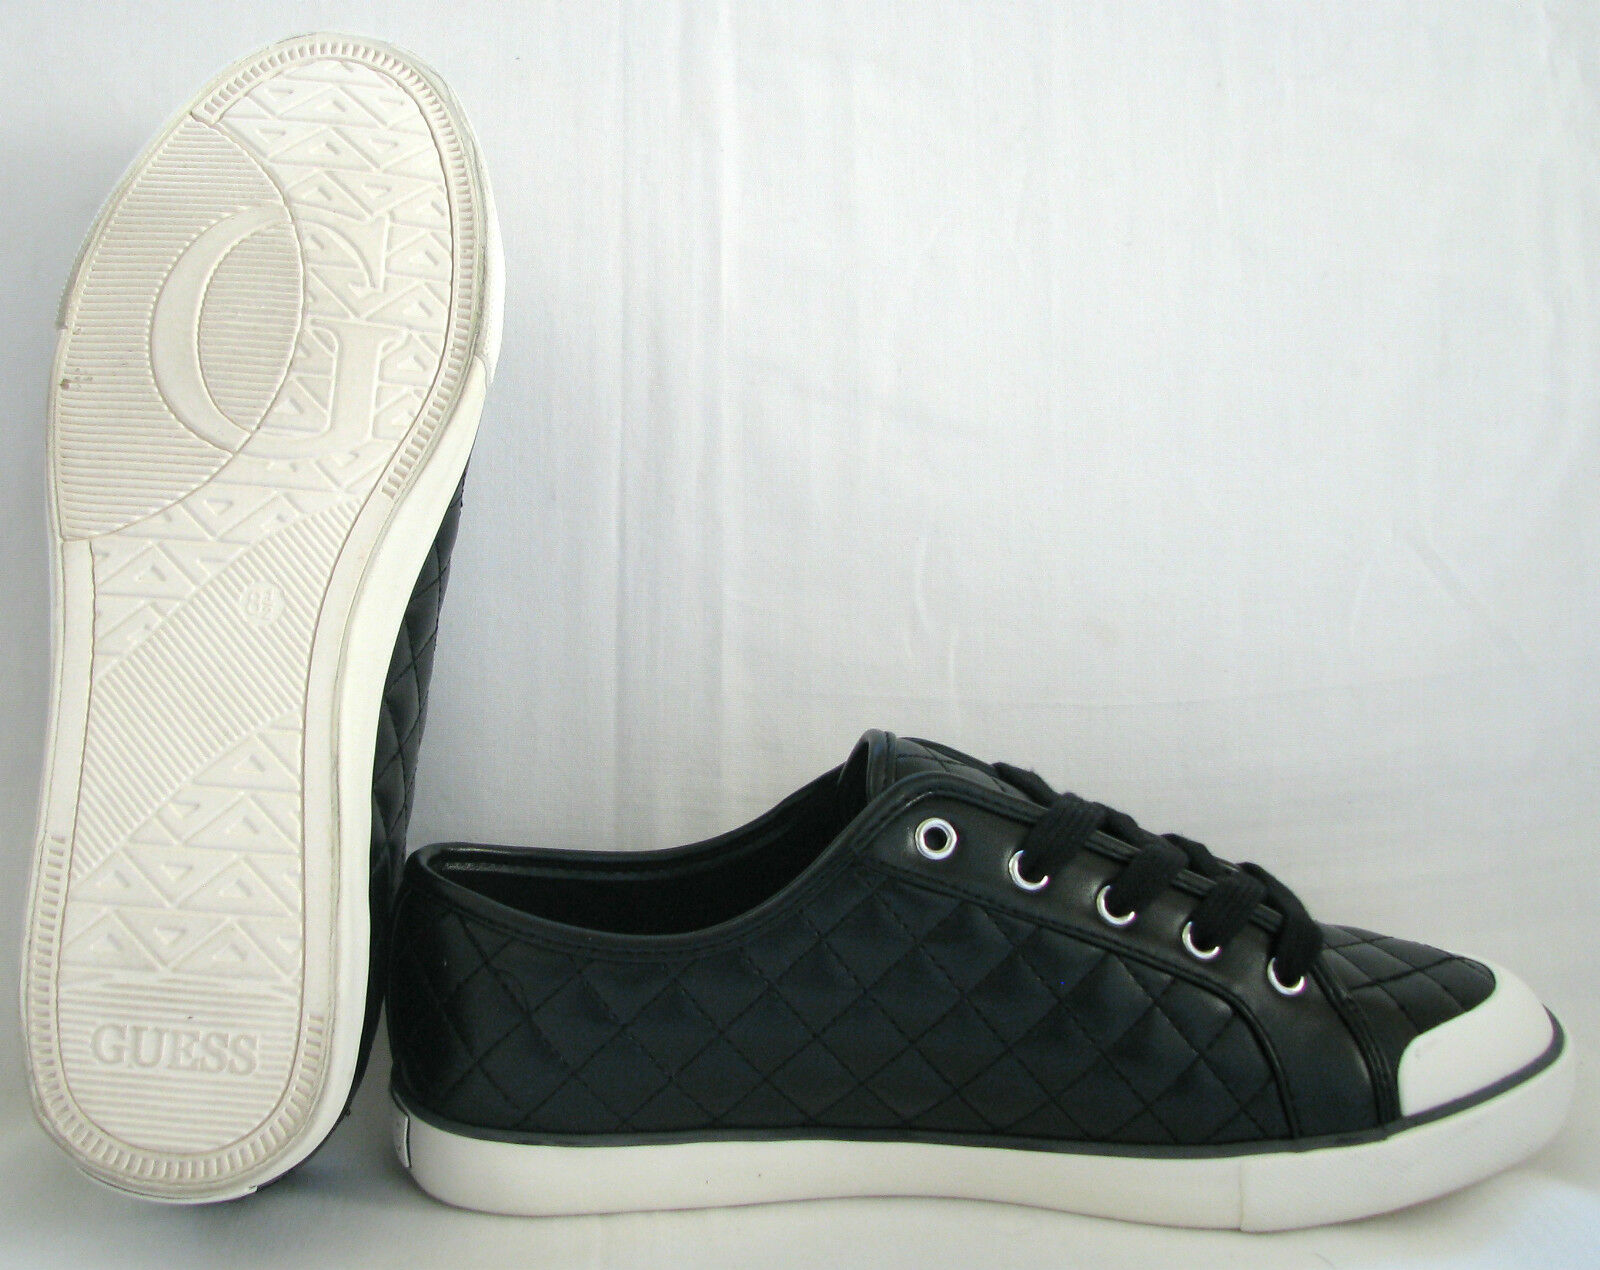 NEW-GUESS TRIM+LOGO BRAXTON BLACK+Weiß CHECKEROT STITCH TRIM+LOGO NEW-GUESS Schuhe SIZE 8.5+BOX f30132